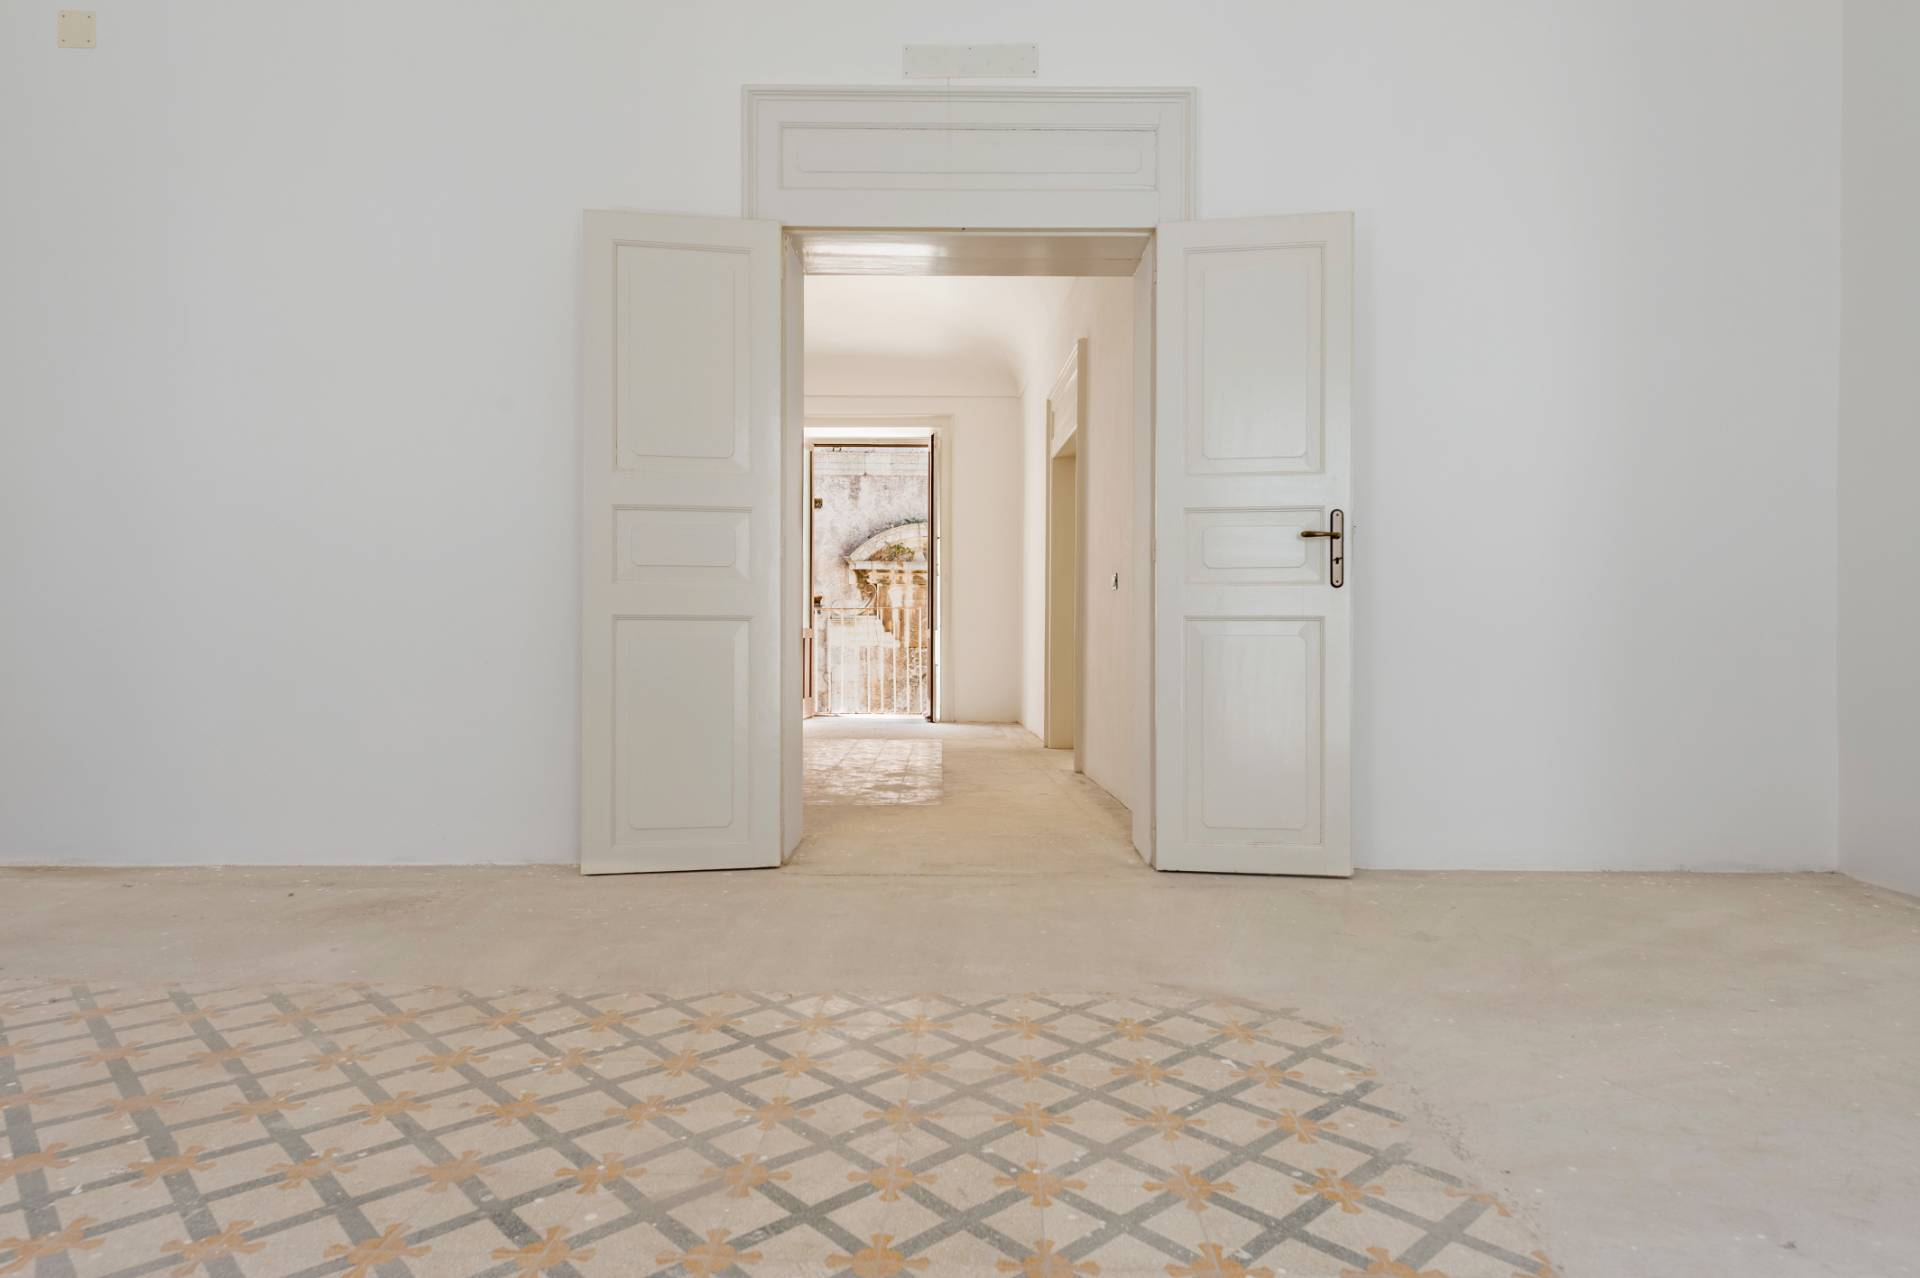 Palazzo in Vendita a Siracusa: 5 locali, 500 mq - Foto 8